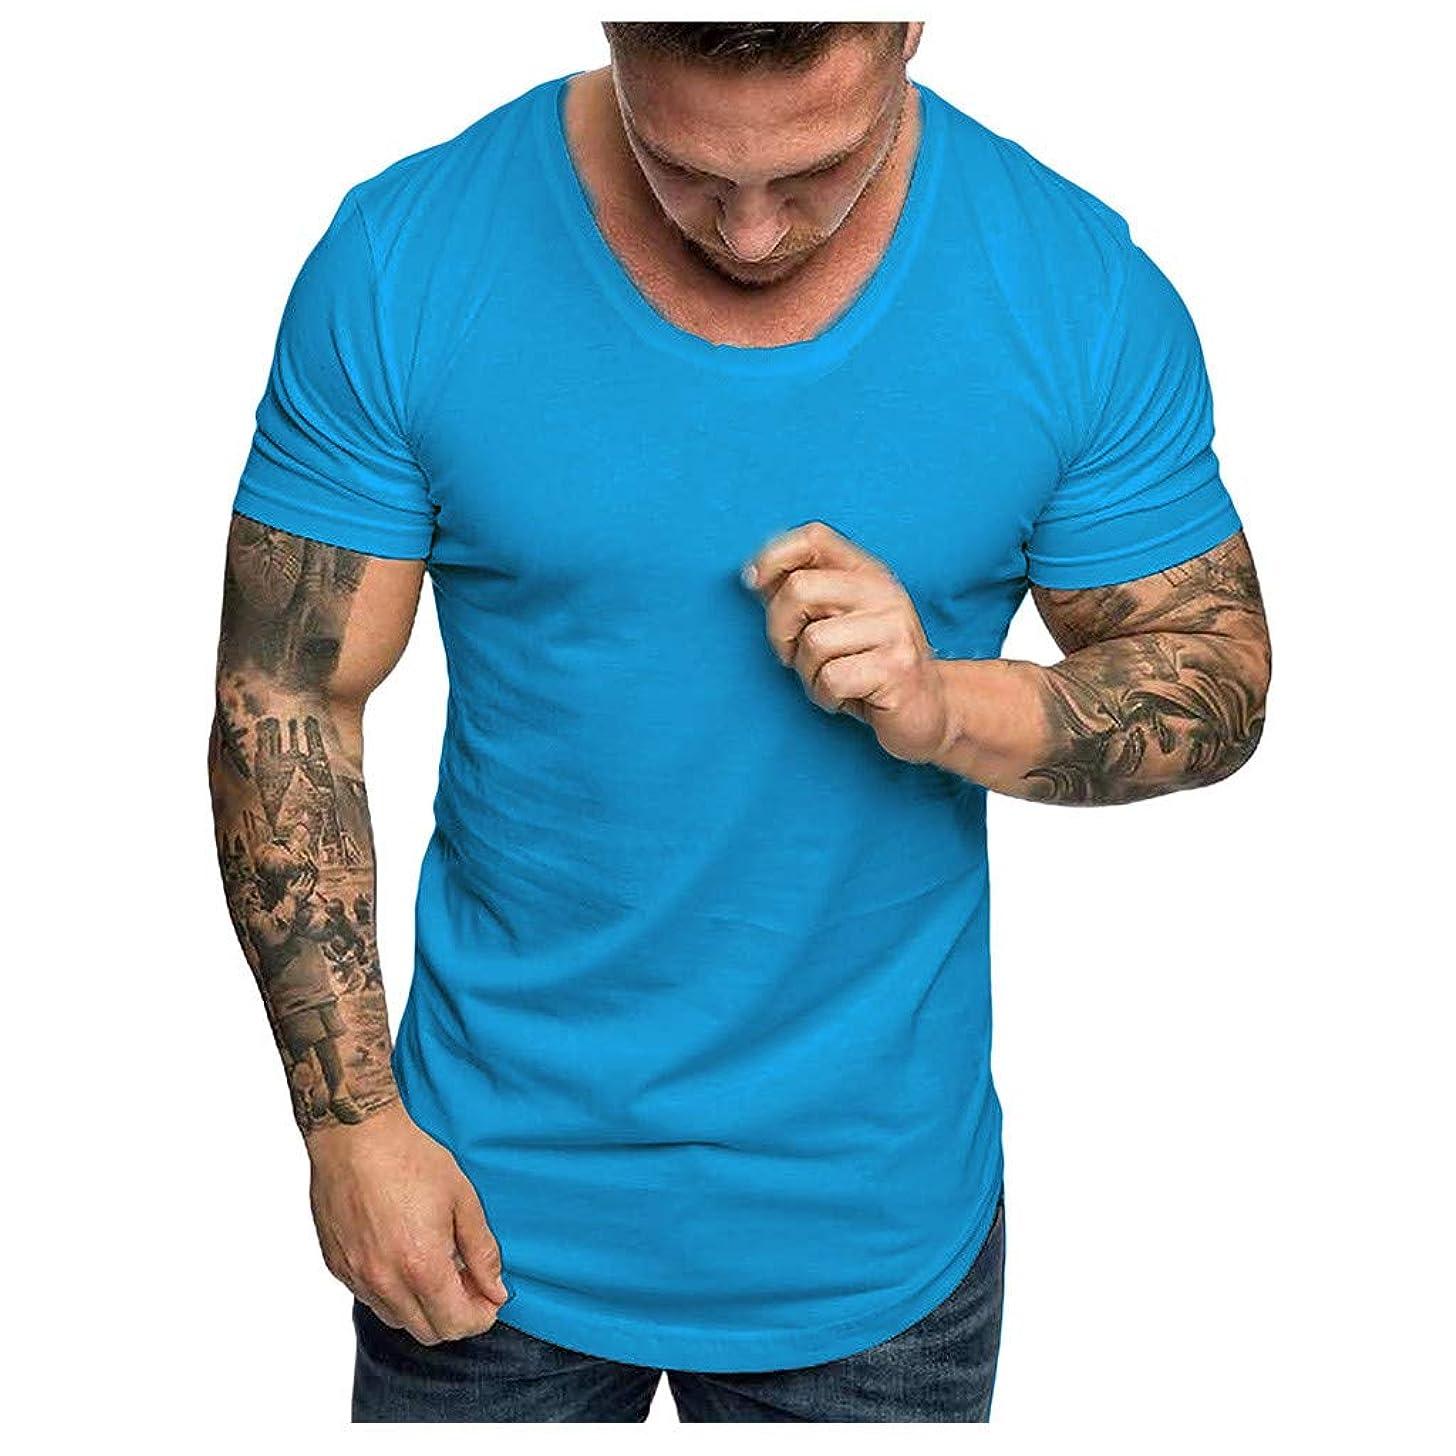 Men's T Shirts Nuewofally Baseliner Heavyweight Cotton T-Shirt Tech Short Sleeve Solid Color Blouse Top (Sky Blue,XL)